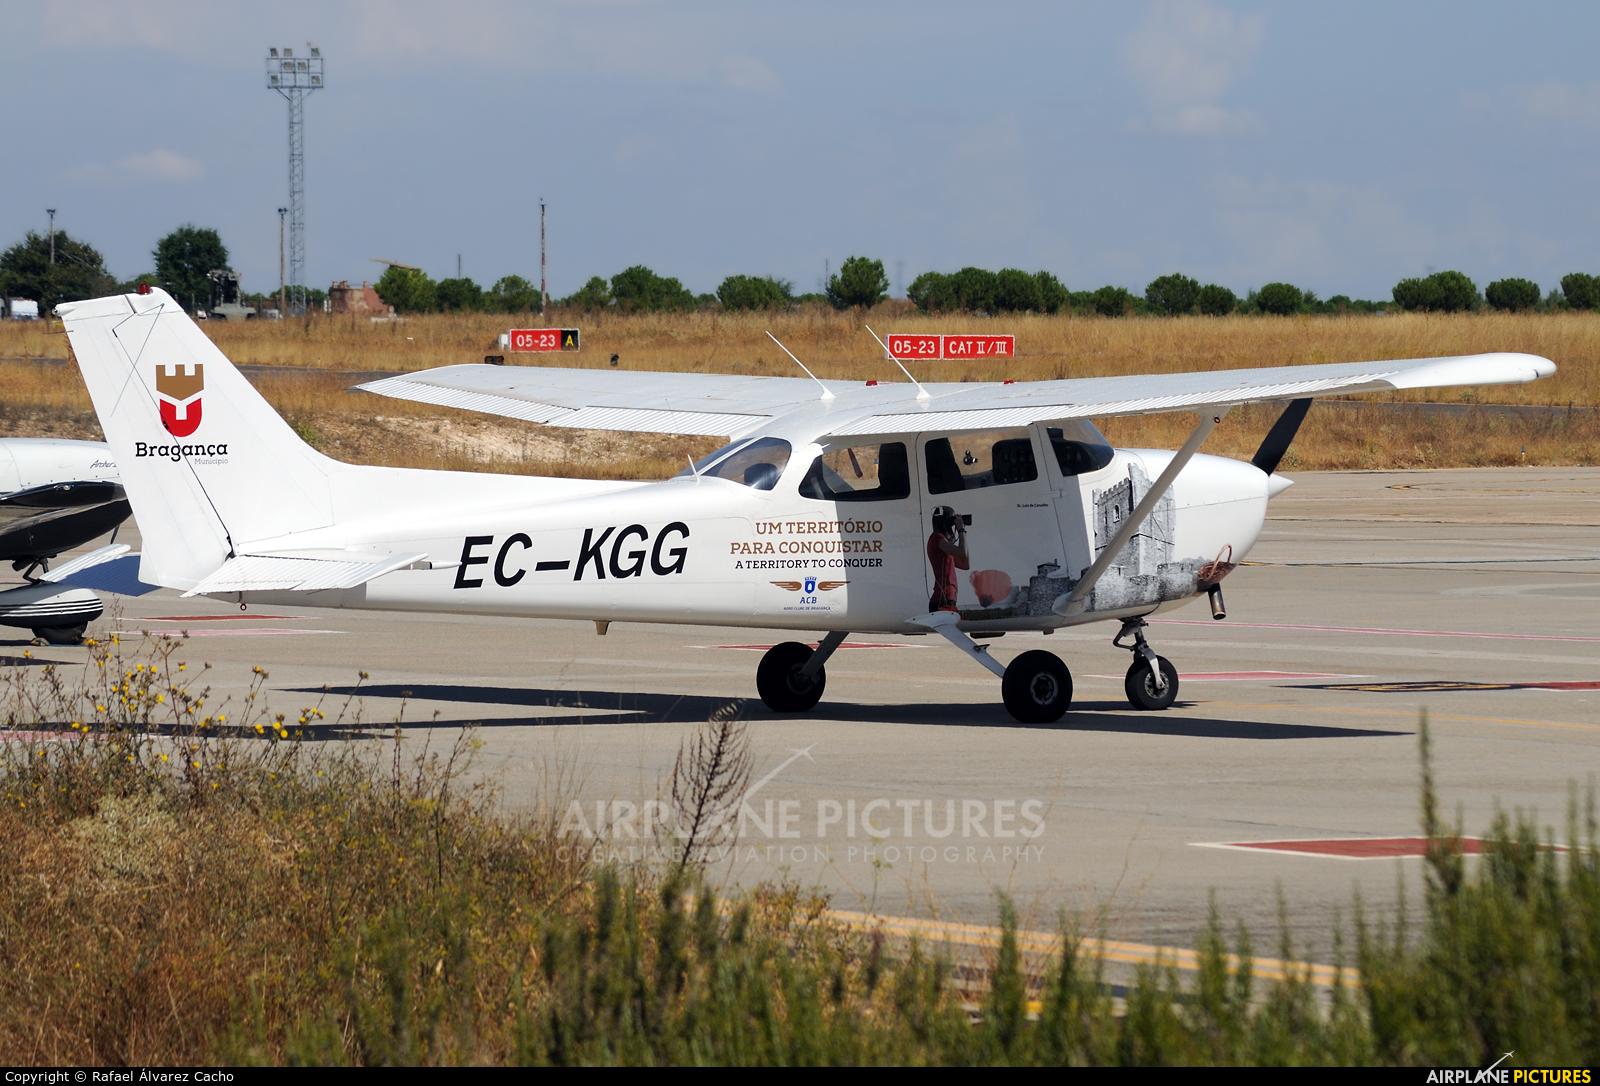 Aero Clube de Bragança EC-KGG aircraft at Valladolid - Villanubla